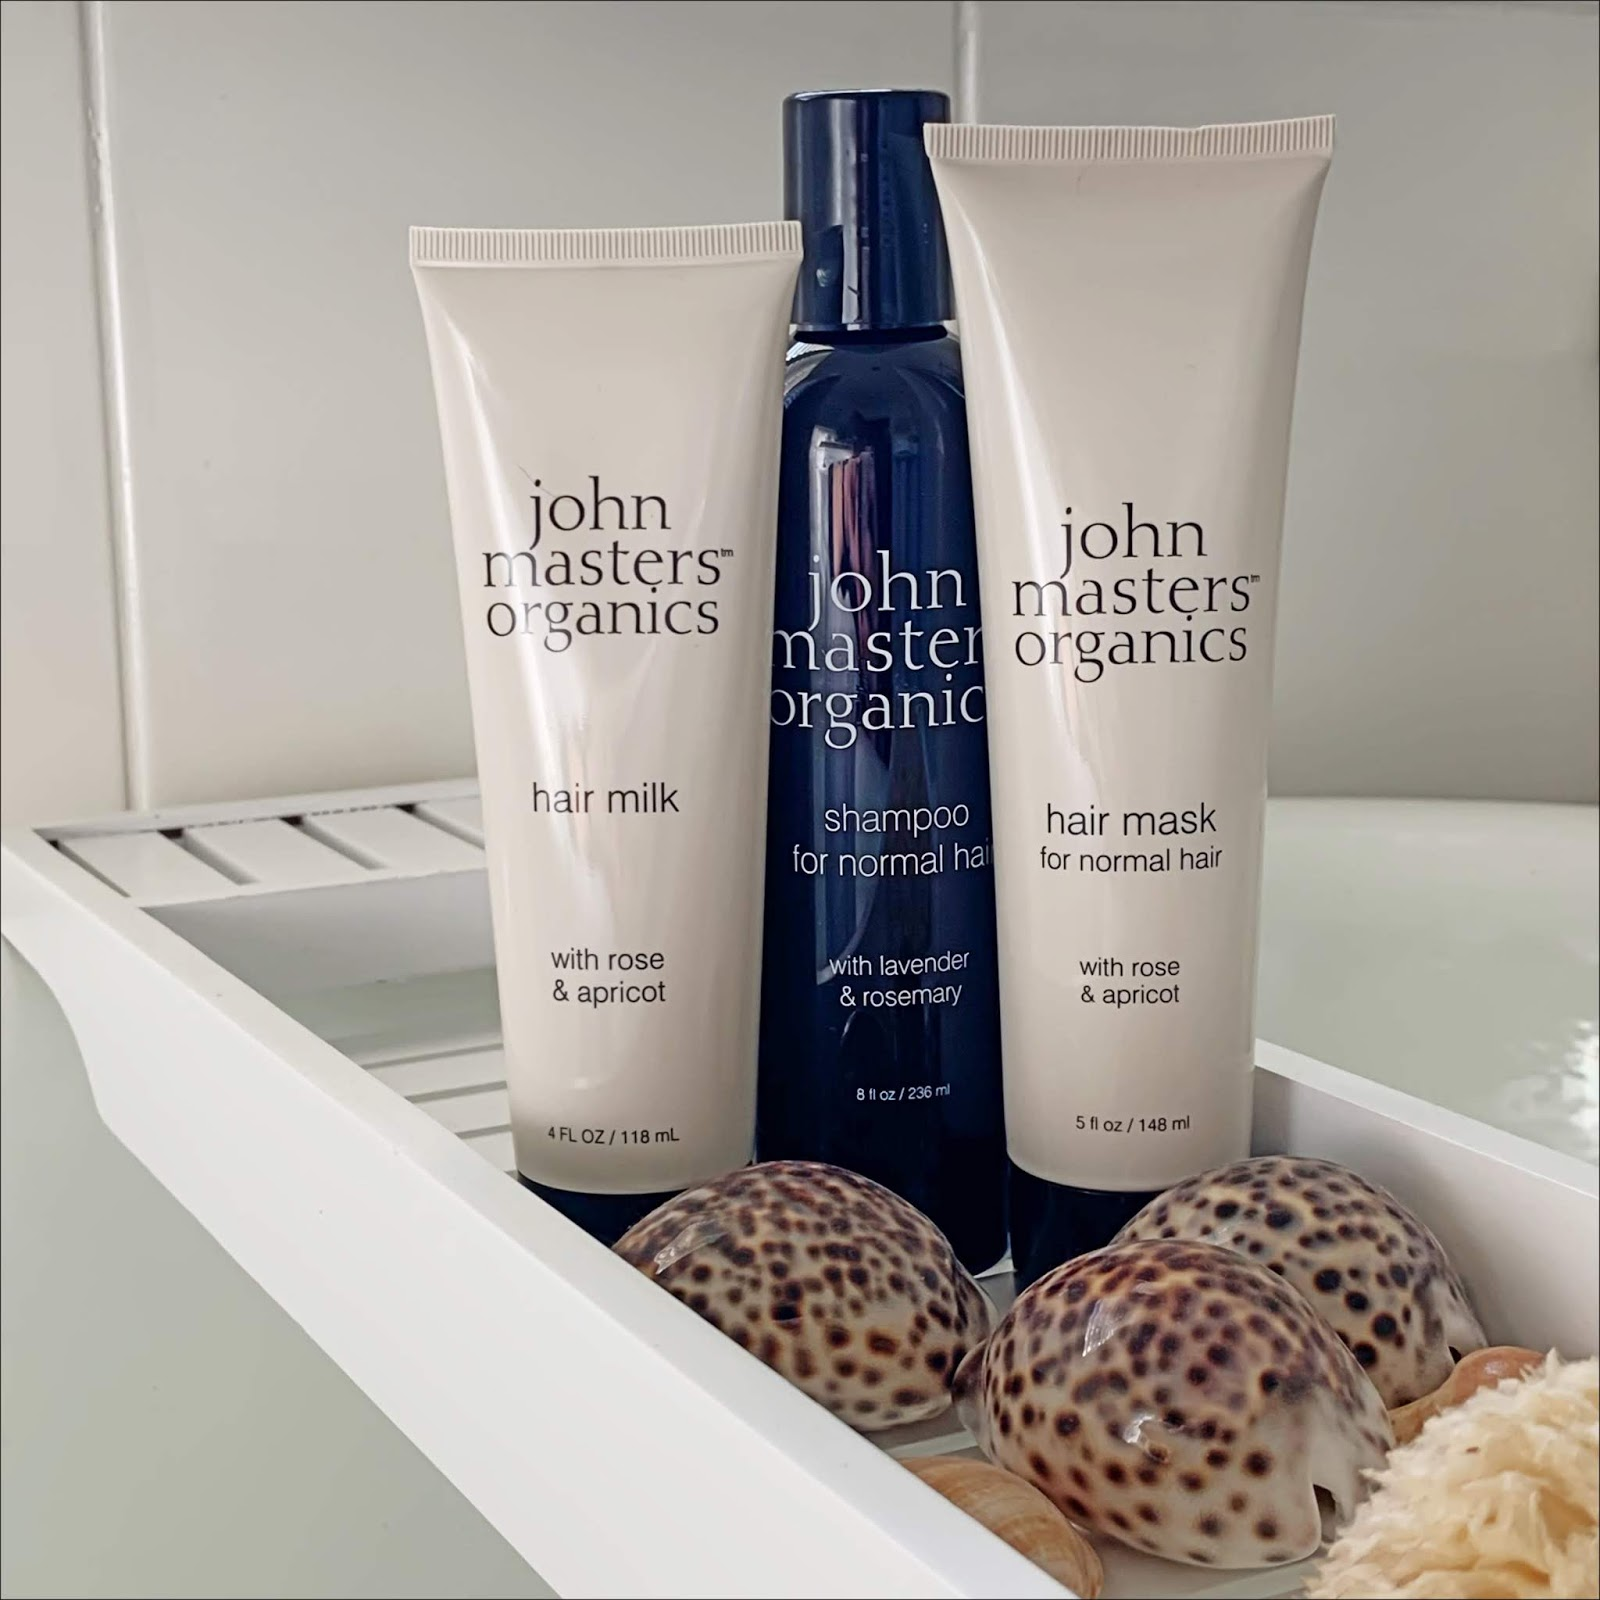 my midlife fashion, john masters organics shampoo, john masters organics hair milk, john masters organics hair mask